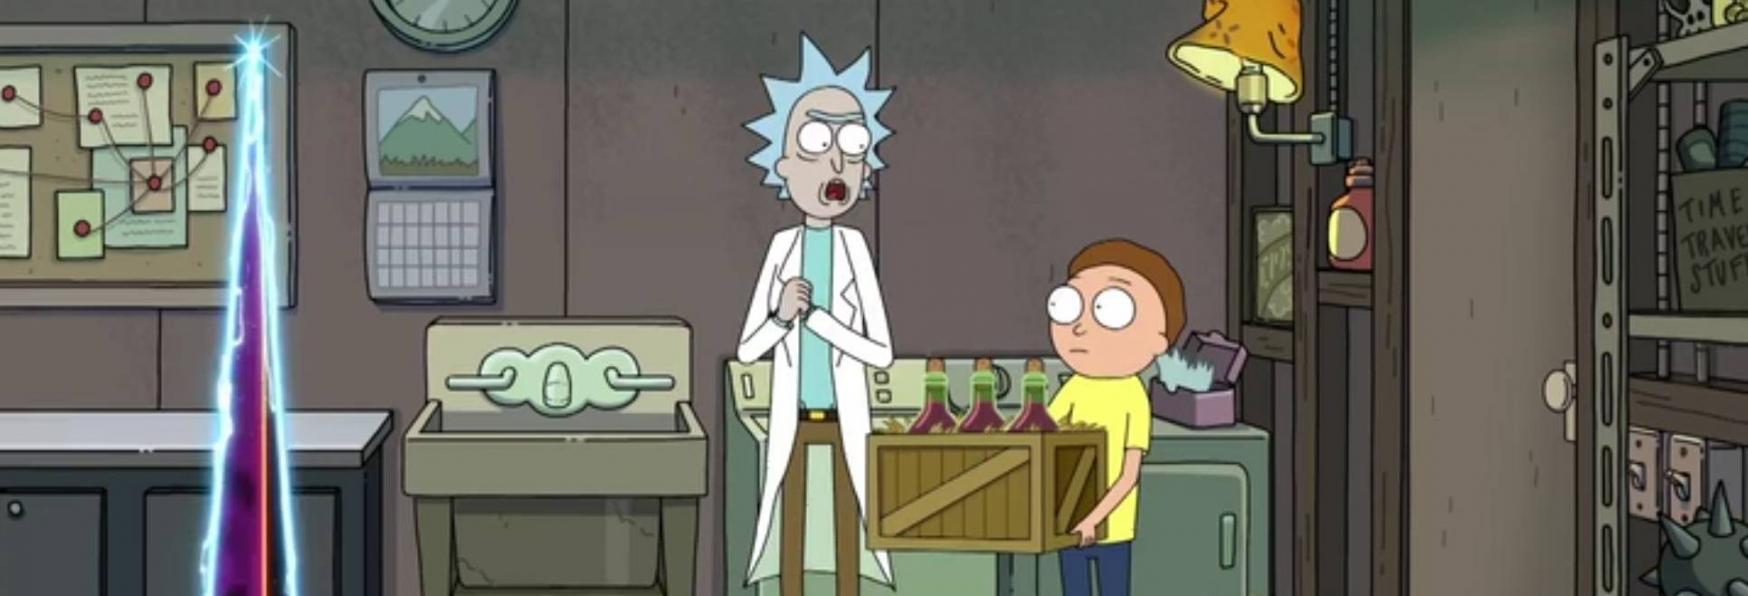 Rick and Morty 5: il nuovo Video Crossover Godzilla vs. Kong